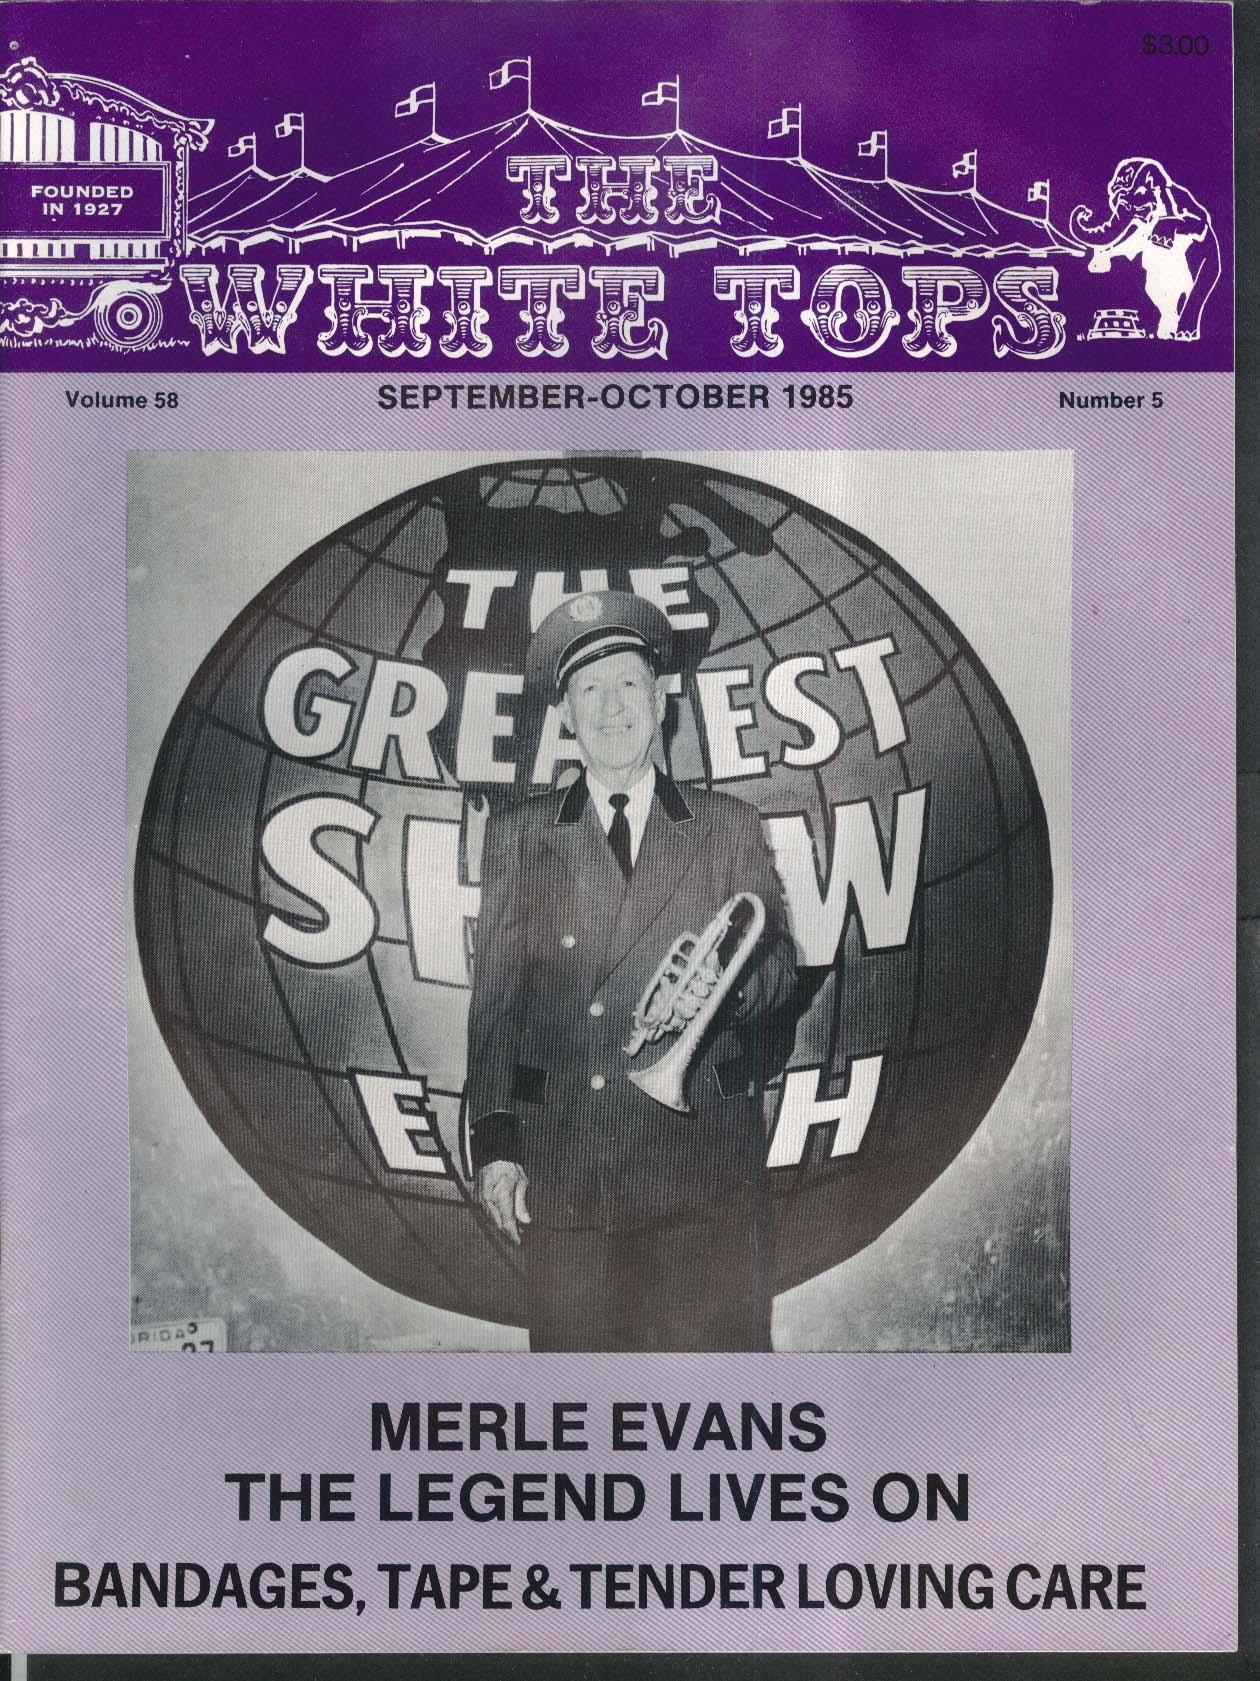 WHITE TOPS Merle Evans Pedro Carillo Tent 9-10 1985